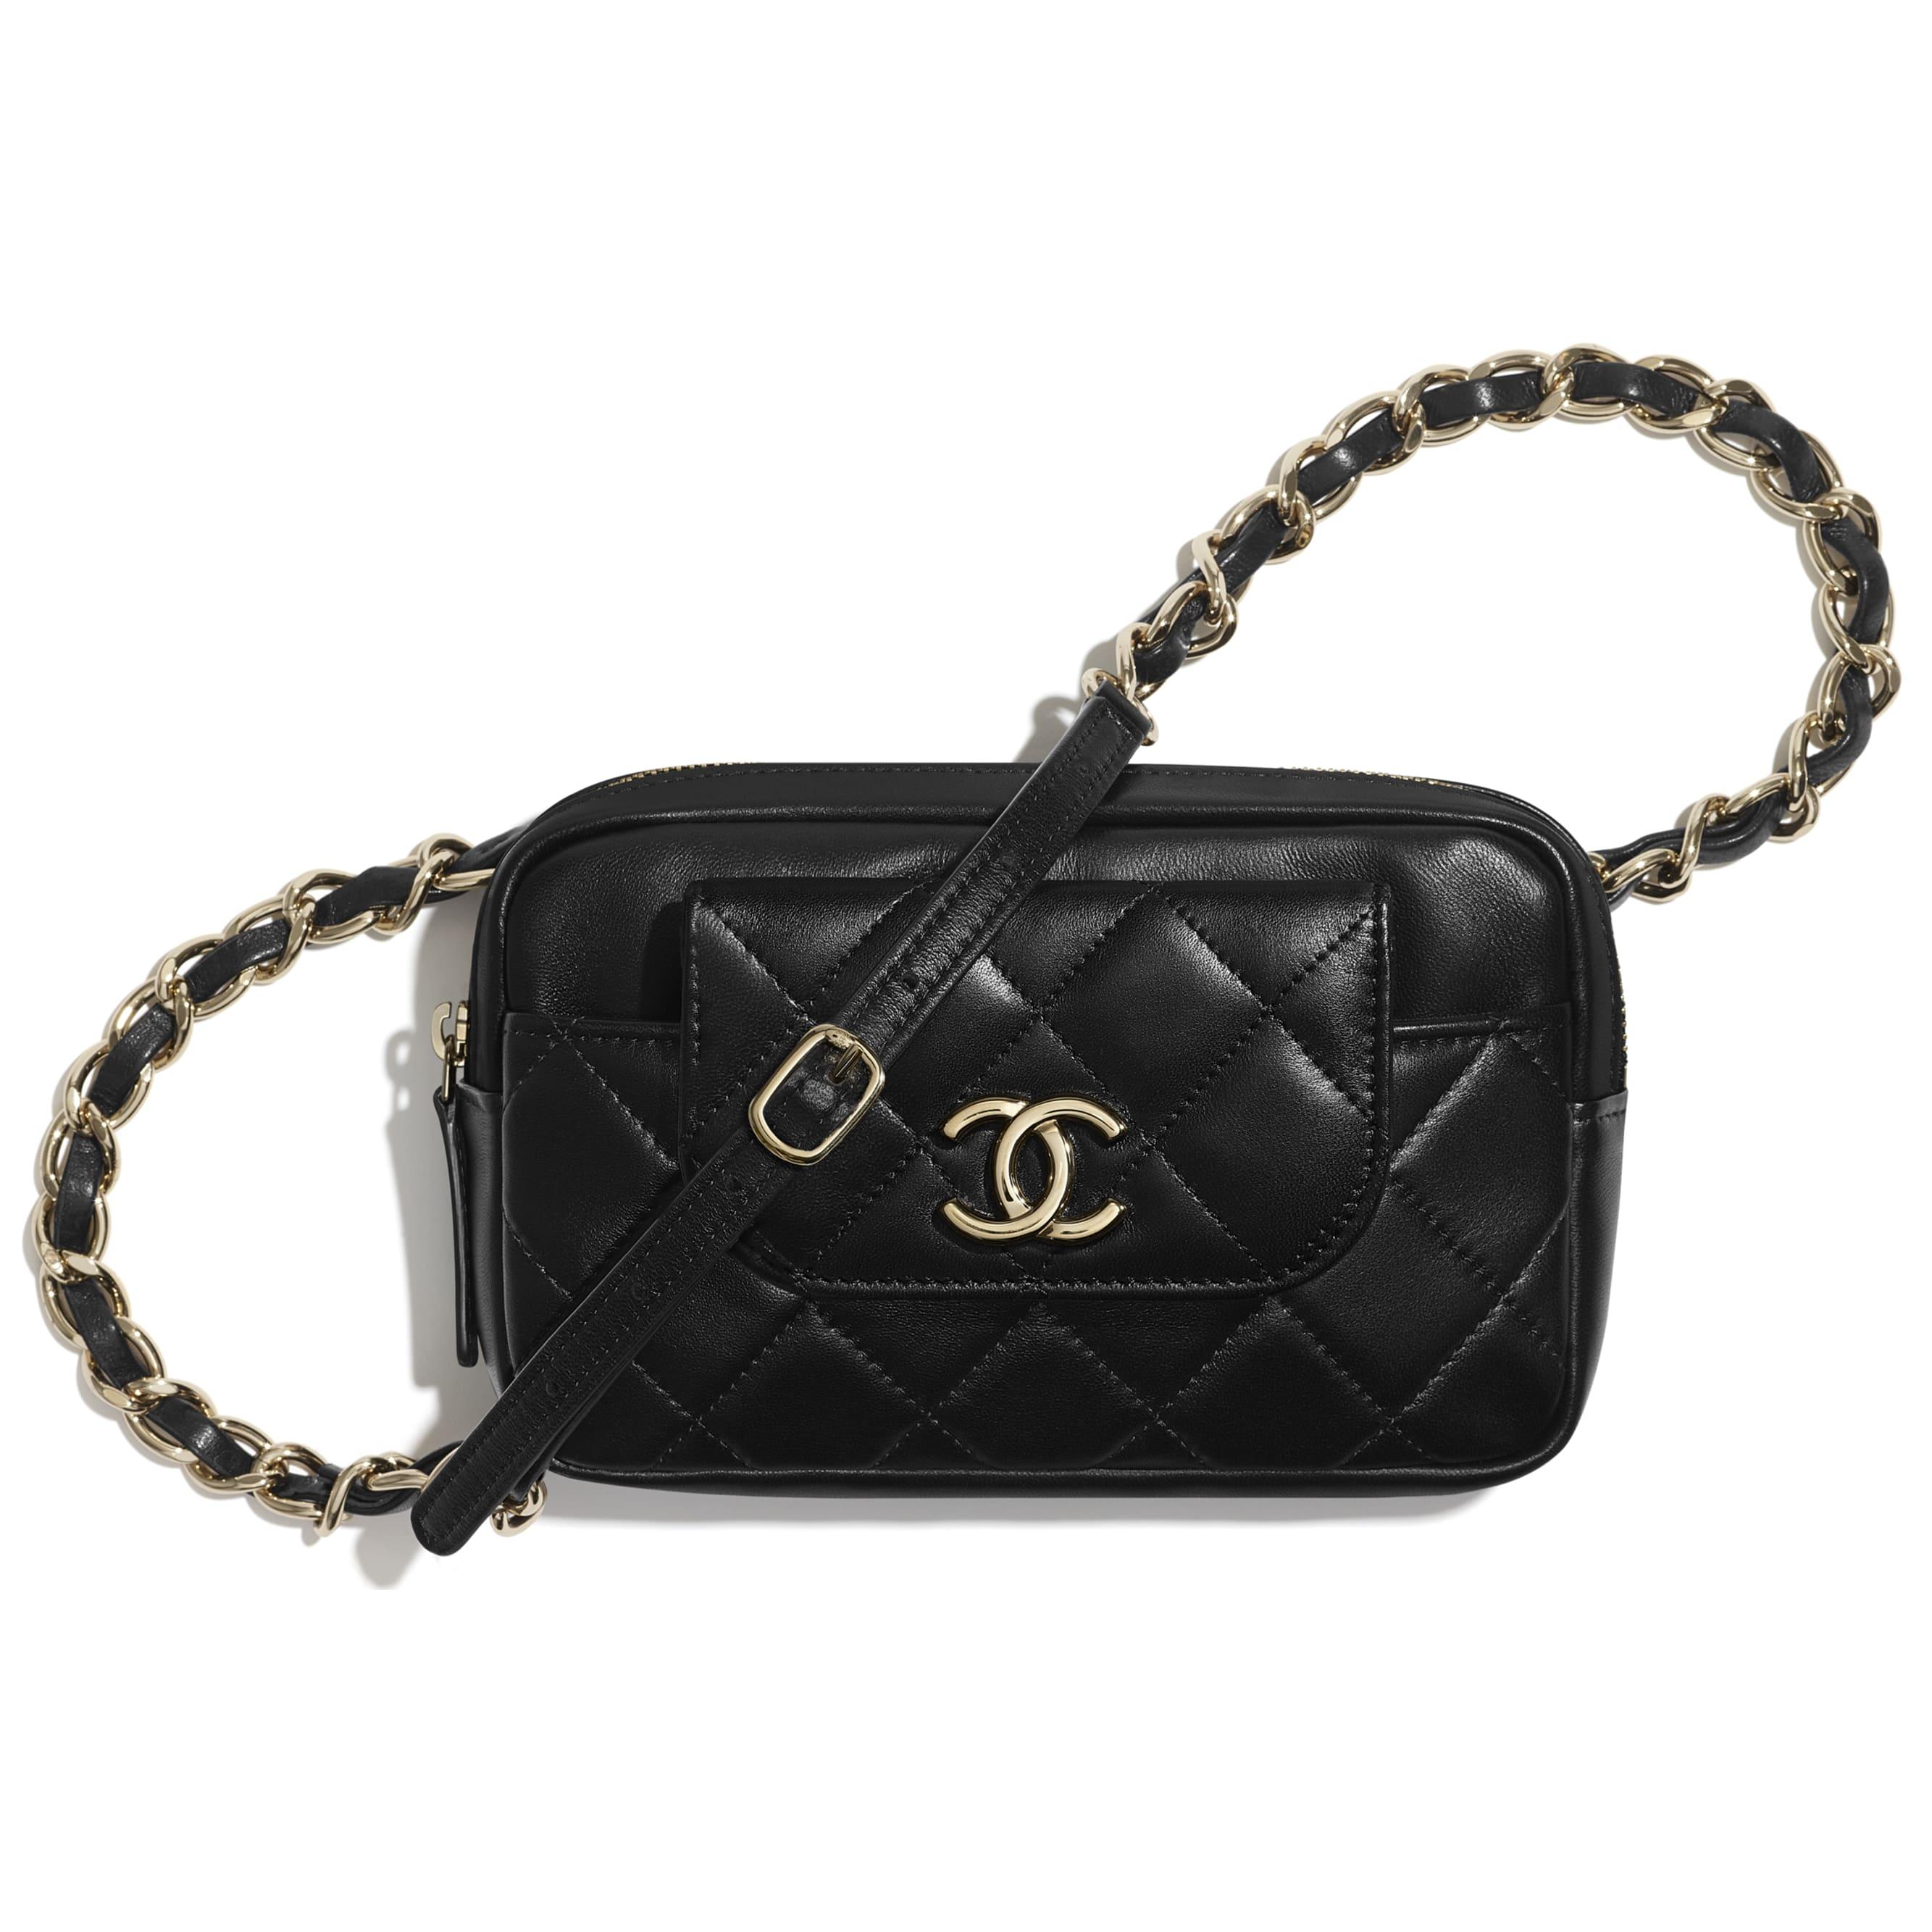 Waist bag - Black - Lambskin & Gold-Tone Metal - CHANEL - Default view - see standard sized version